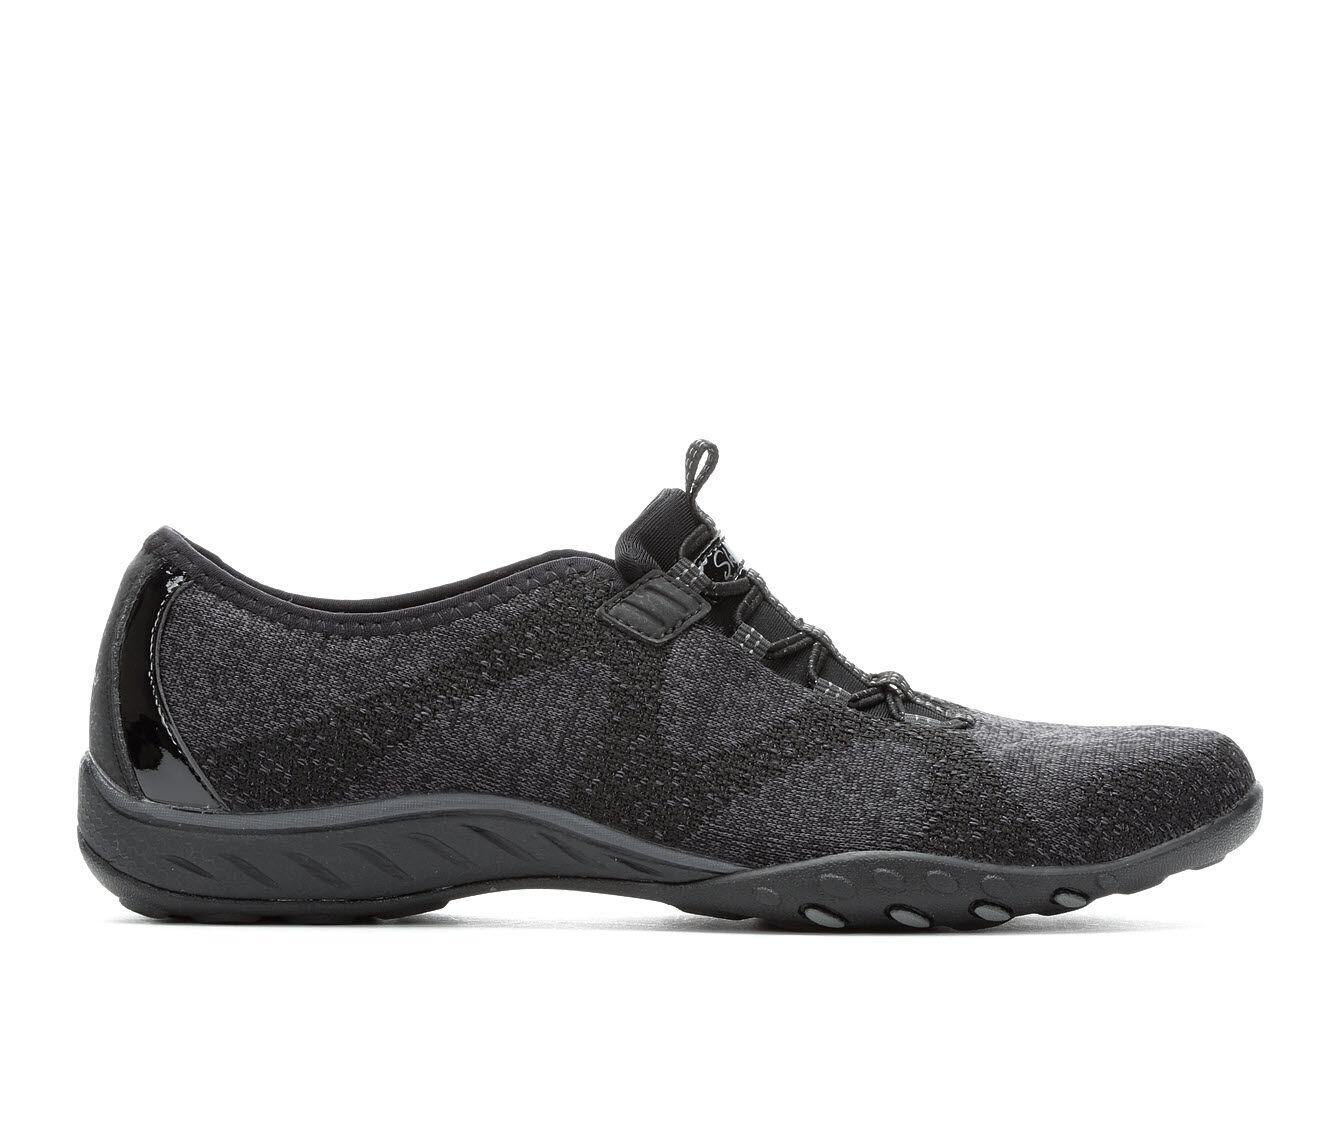 uk shoes_kd2744